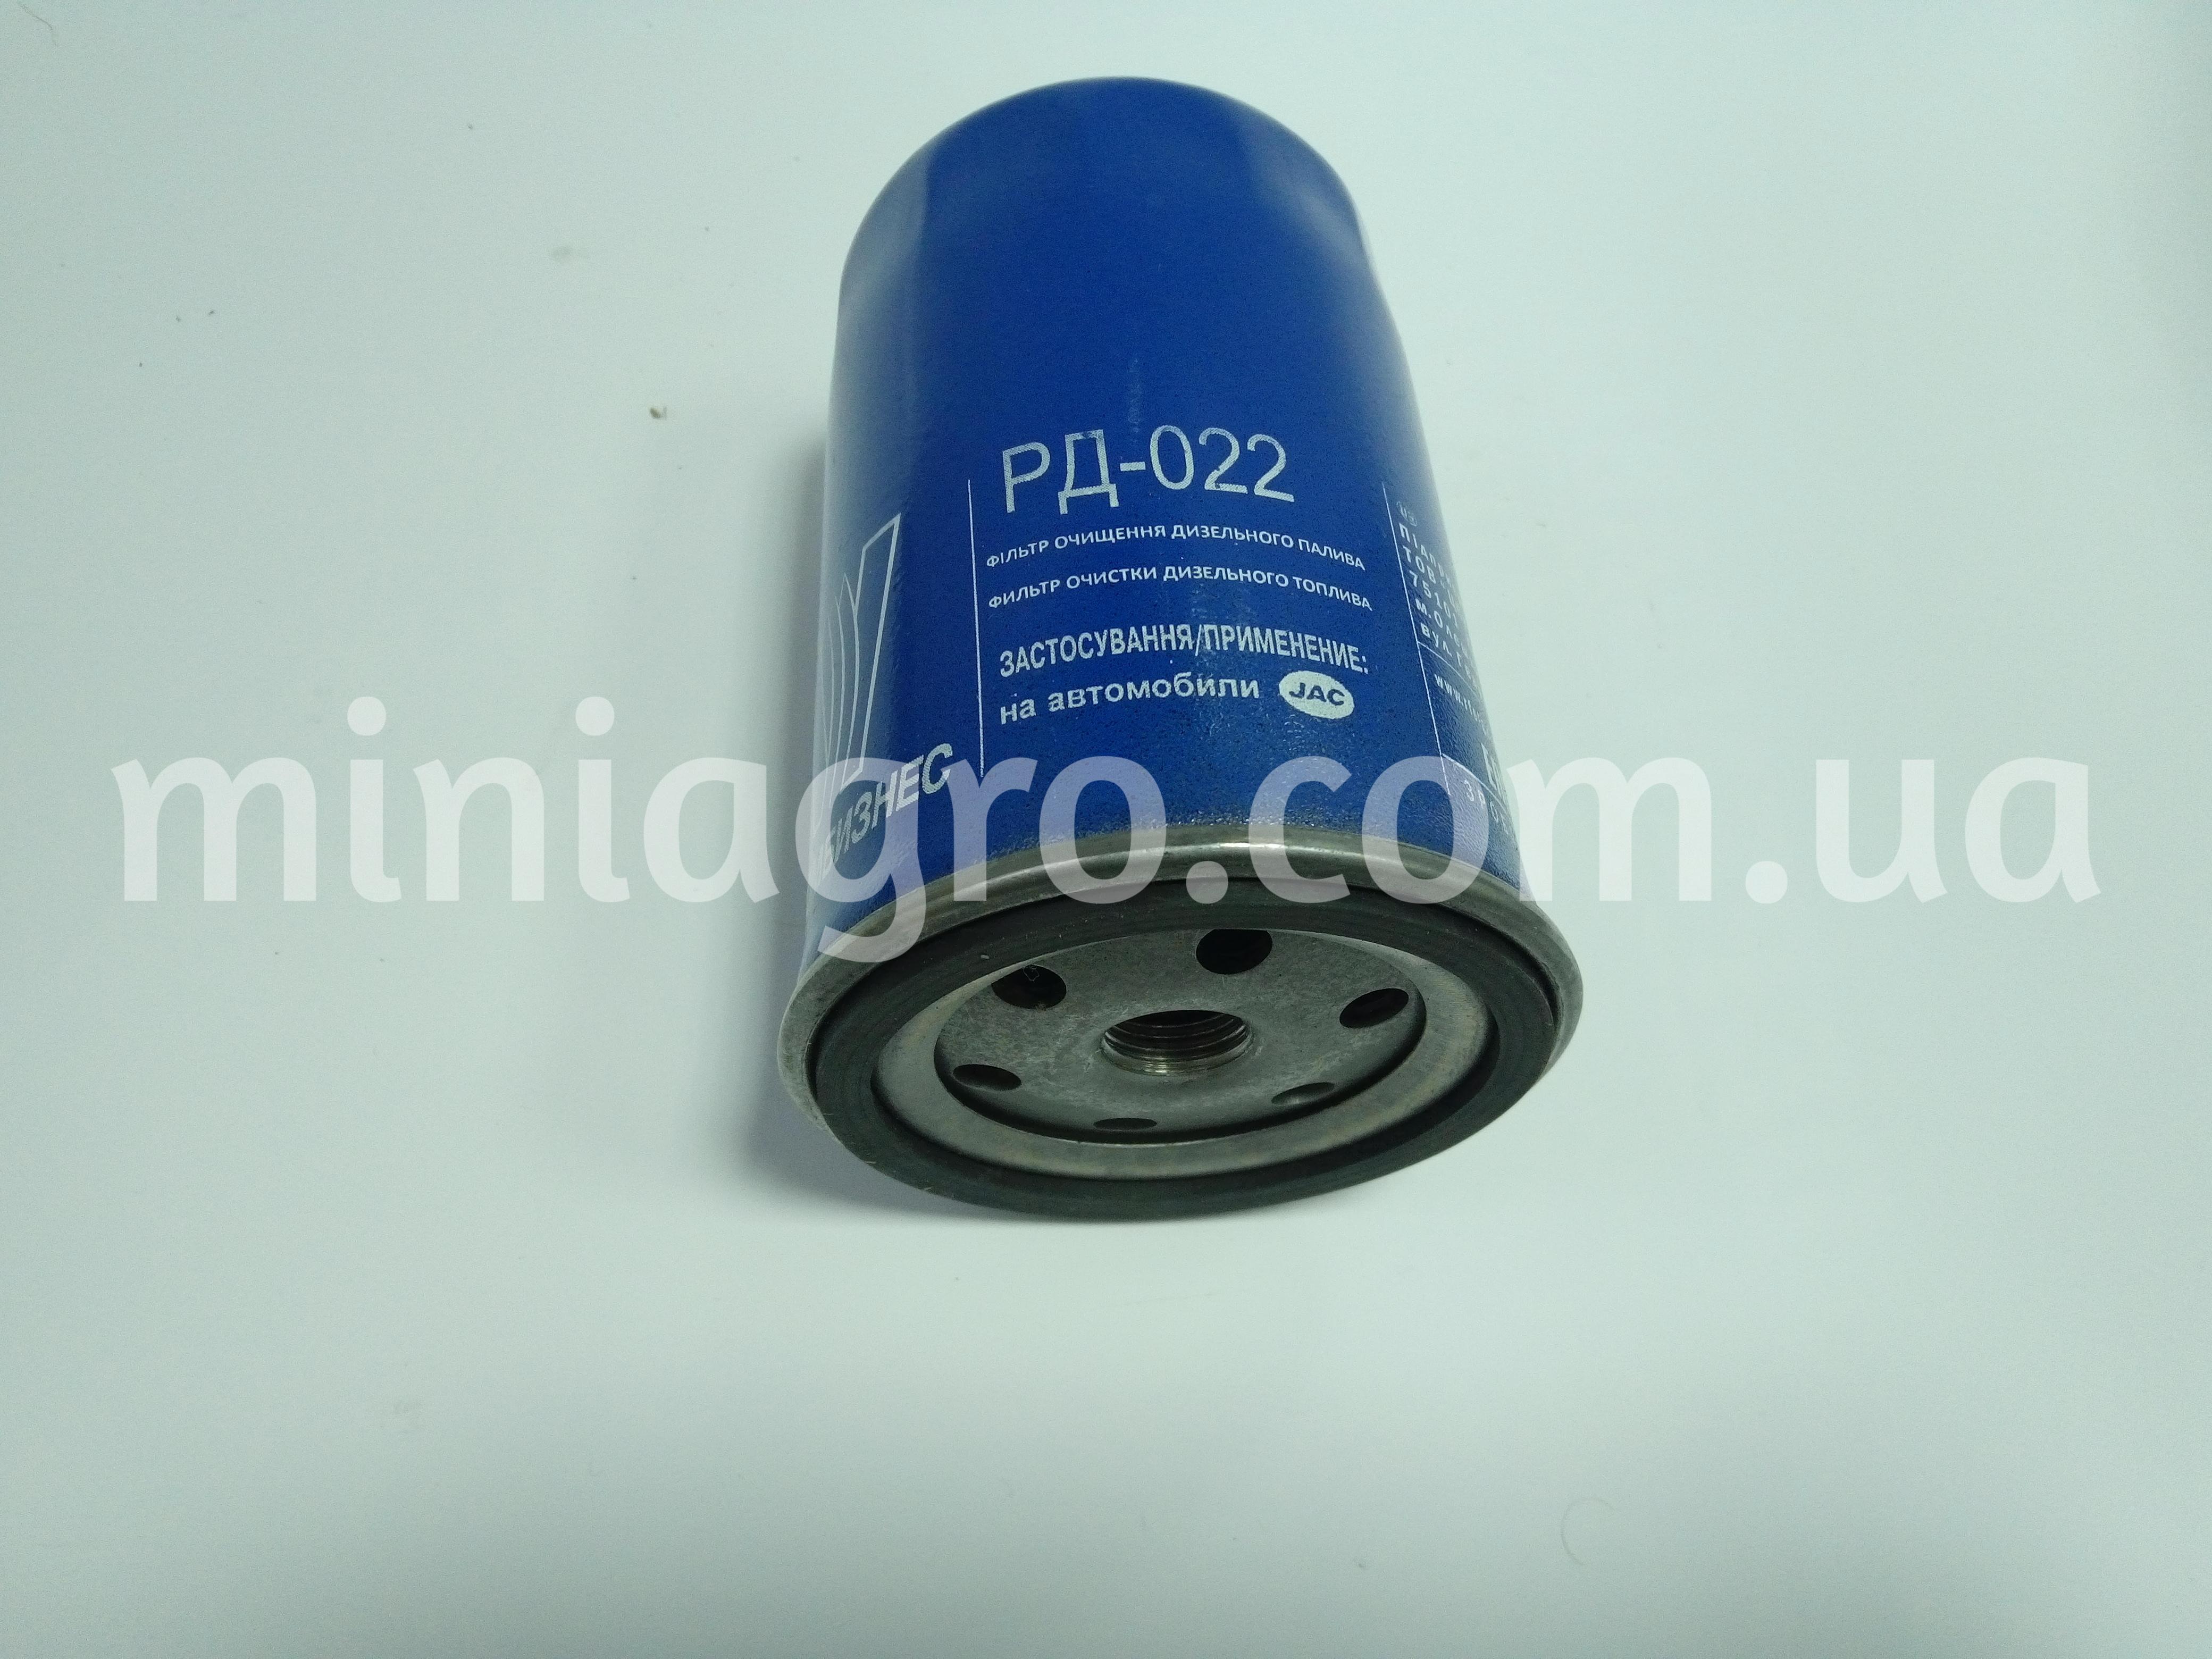 Фильтр топливный РД-022 на КМ385ВТ DF244, FS244, Zoomlion 244rd, Jinma 264, Jinma 244E, Lovol 244